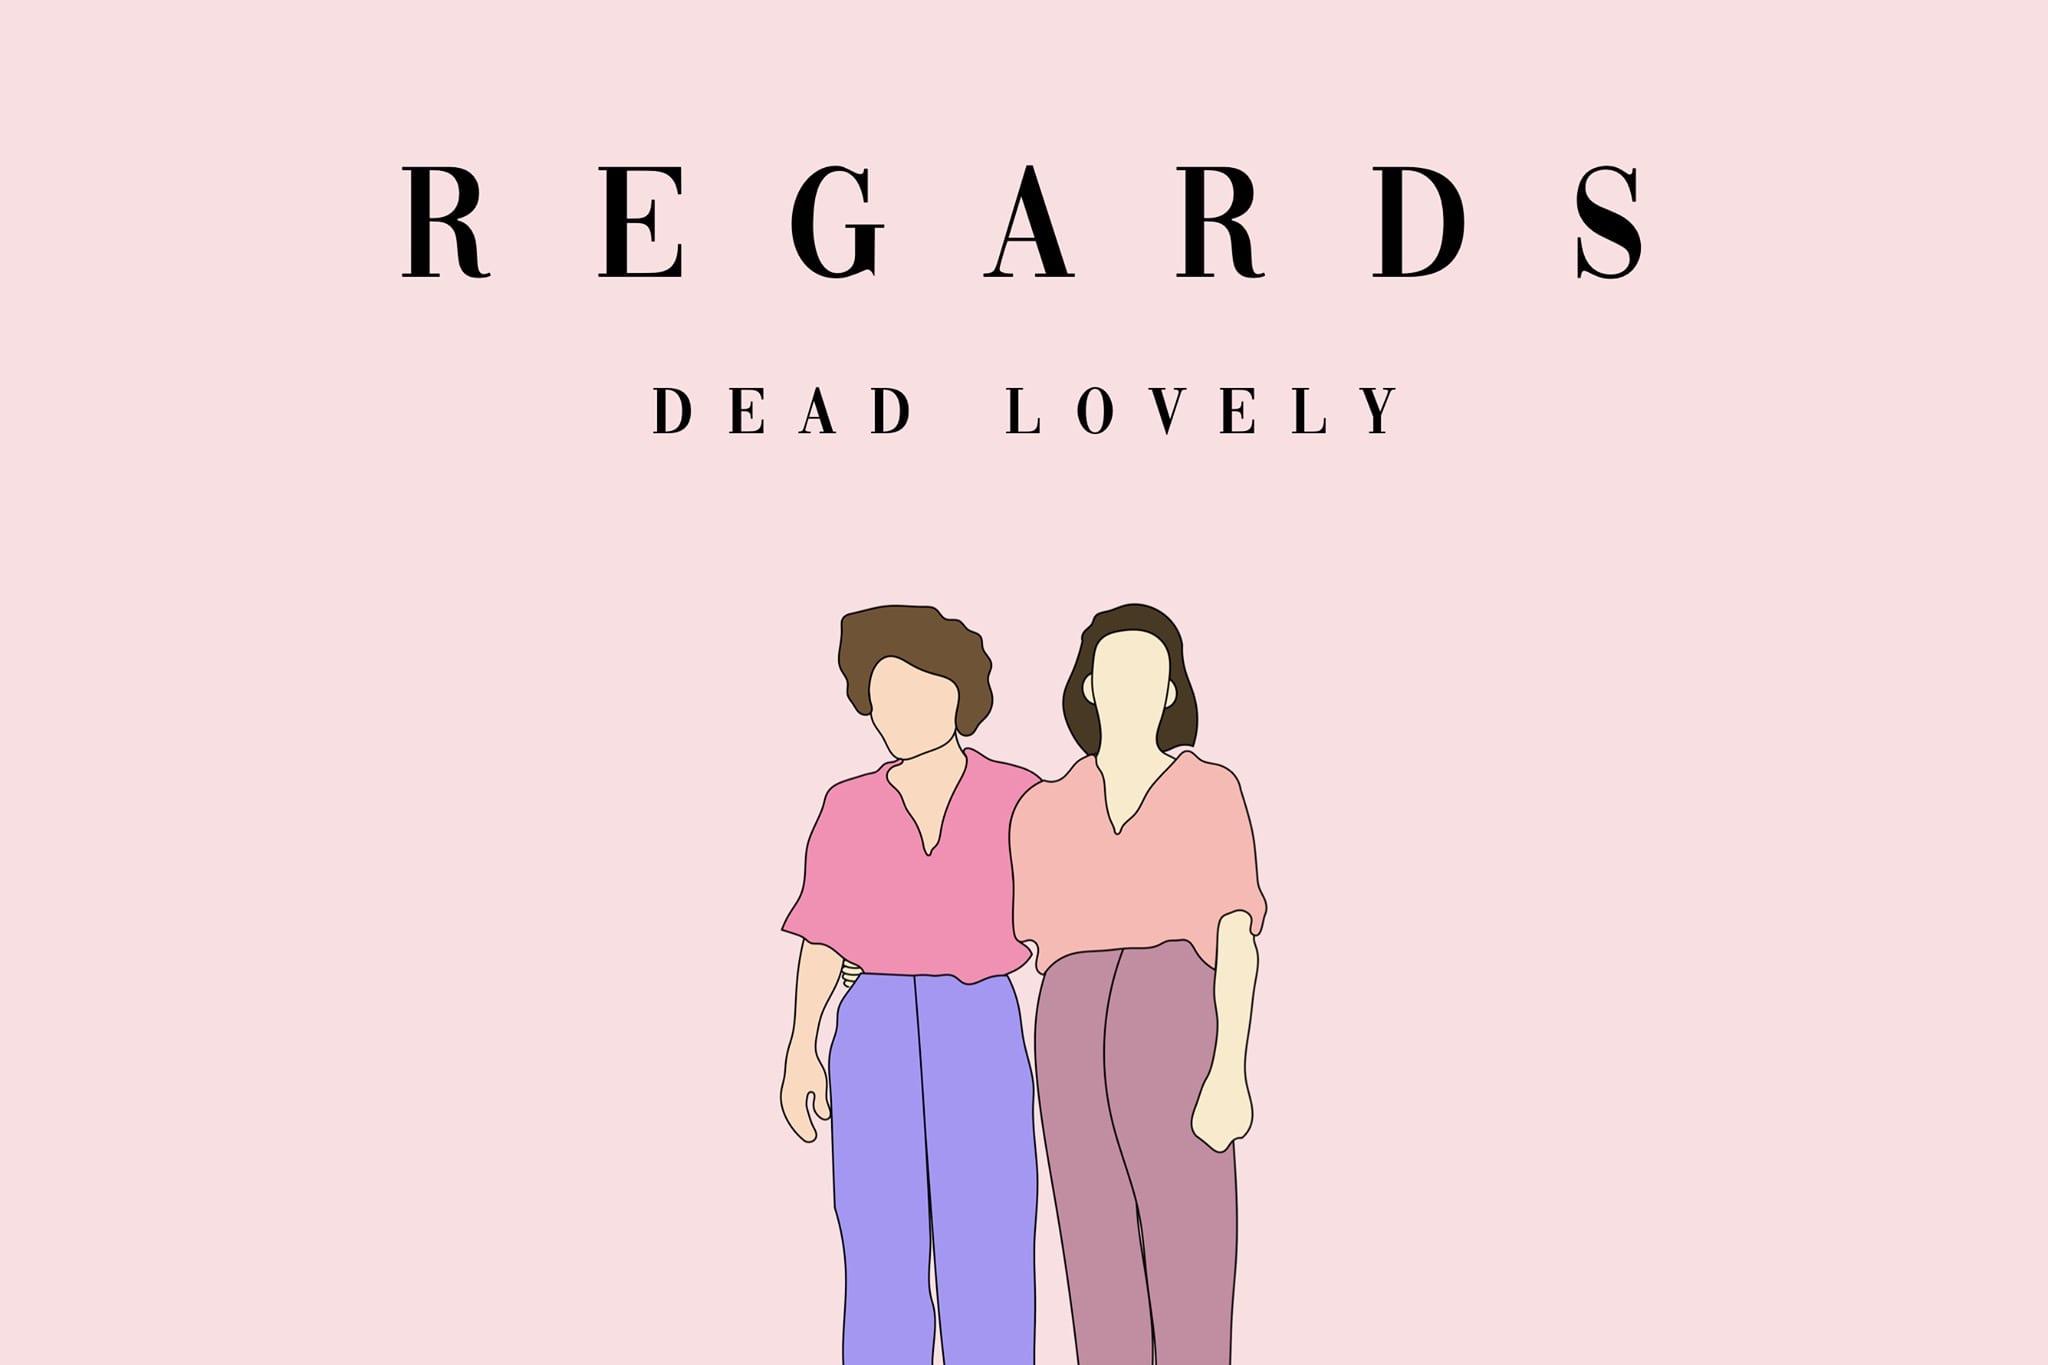 Regards – Dead Lovely